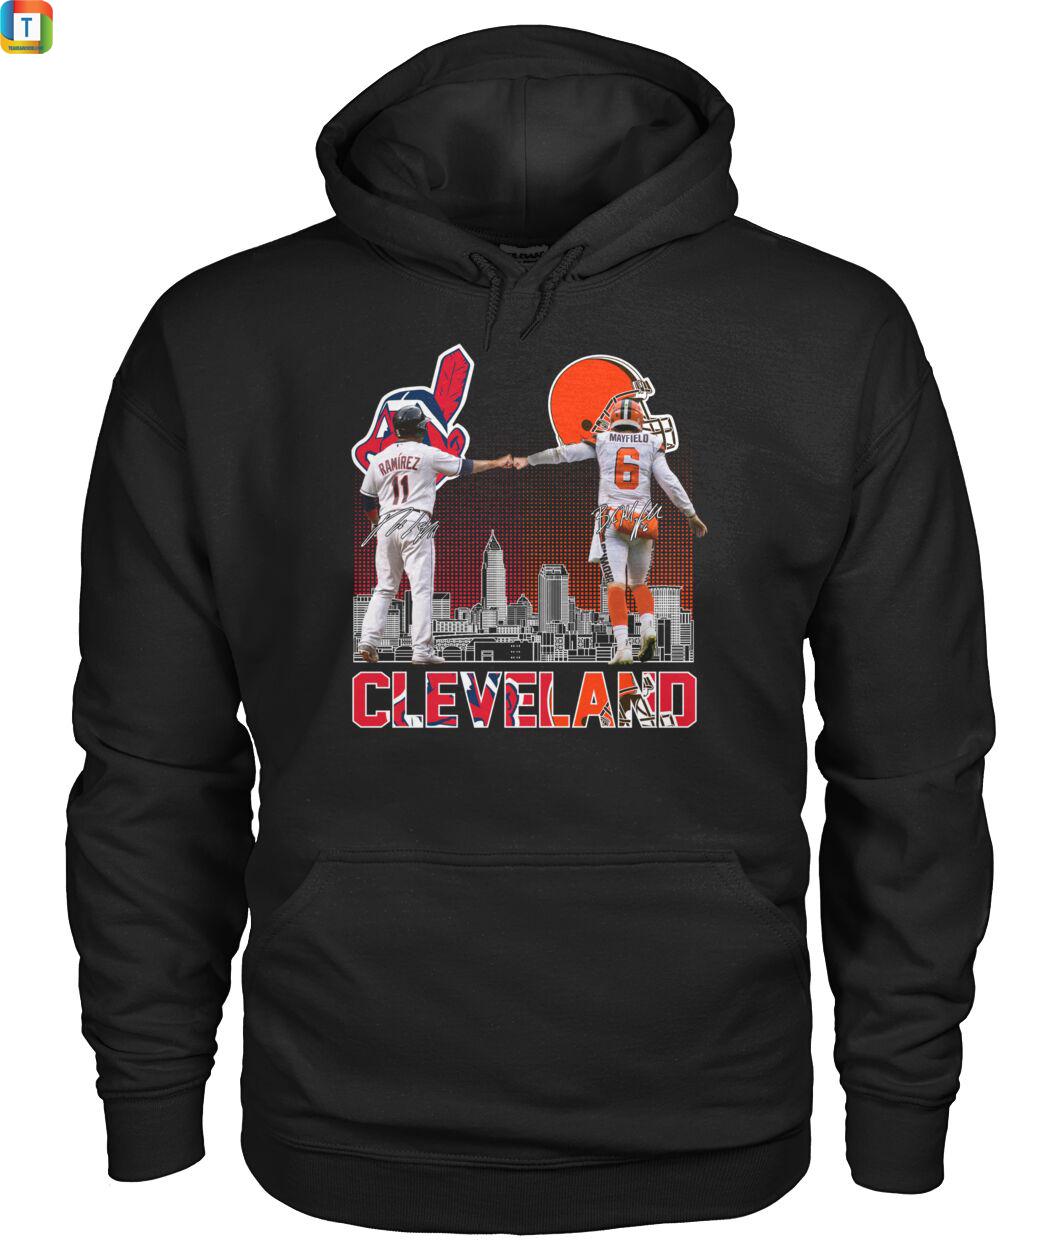 Cleveland José Ramirez And Baker Mayfield Signature hoodie